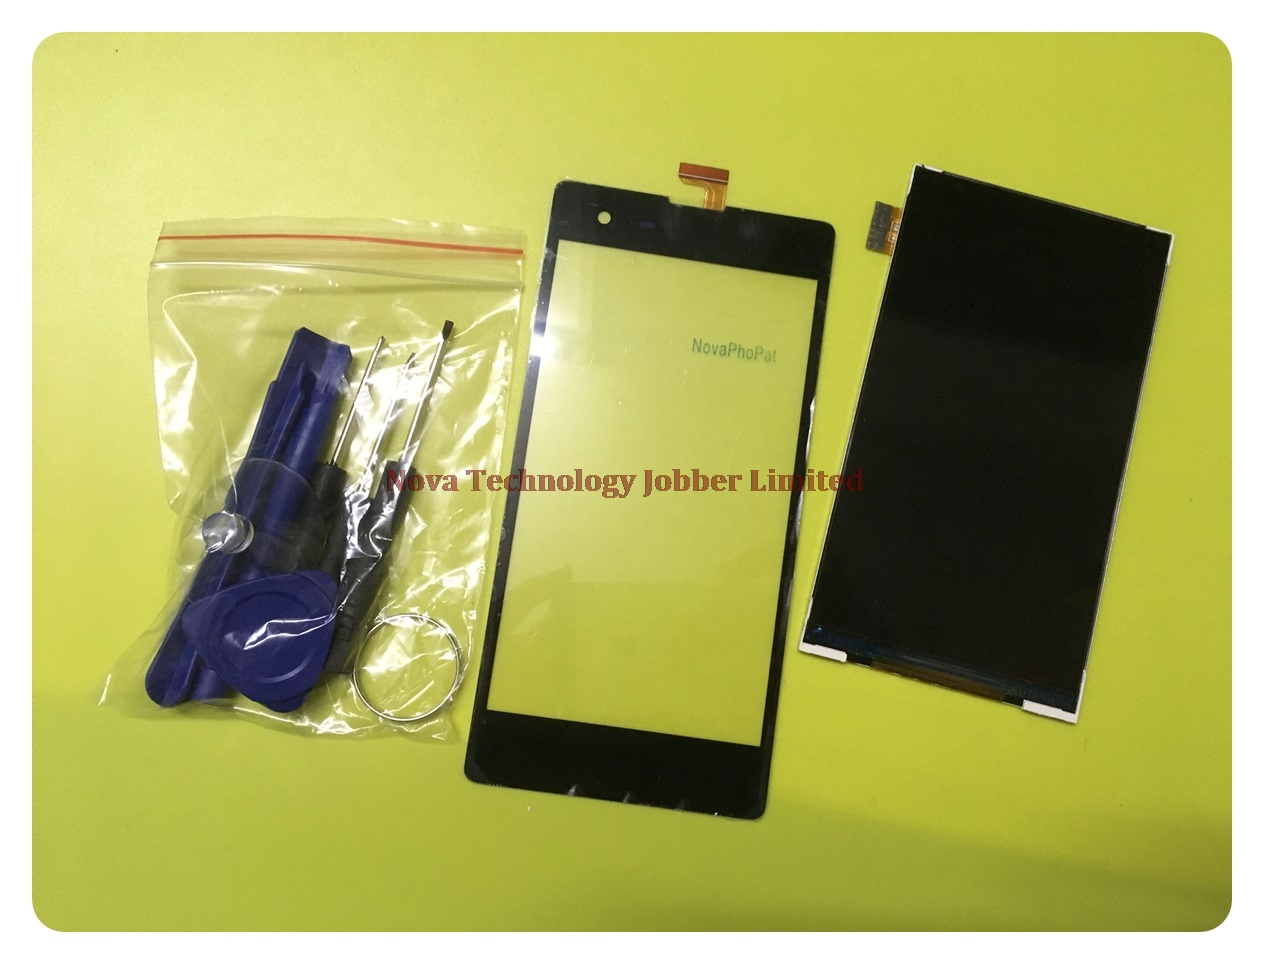 X 510 LCD Display Screen + Touch Screen Digitizer Sensor for Infinix Hot 2 X510 Lcd and SensorX 510 LCD Display Screen + Touch Screen Digitizer Sensor for Infinix Hot 2 X510 Lcd and Sensor